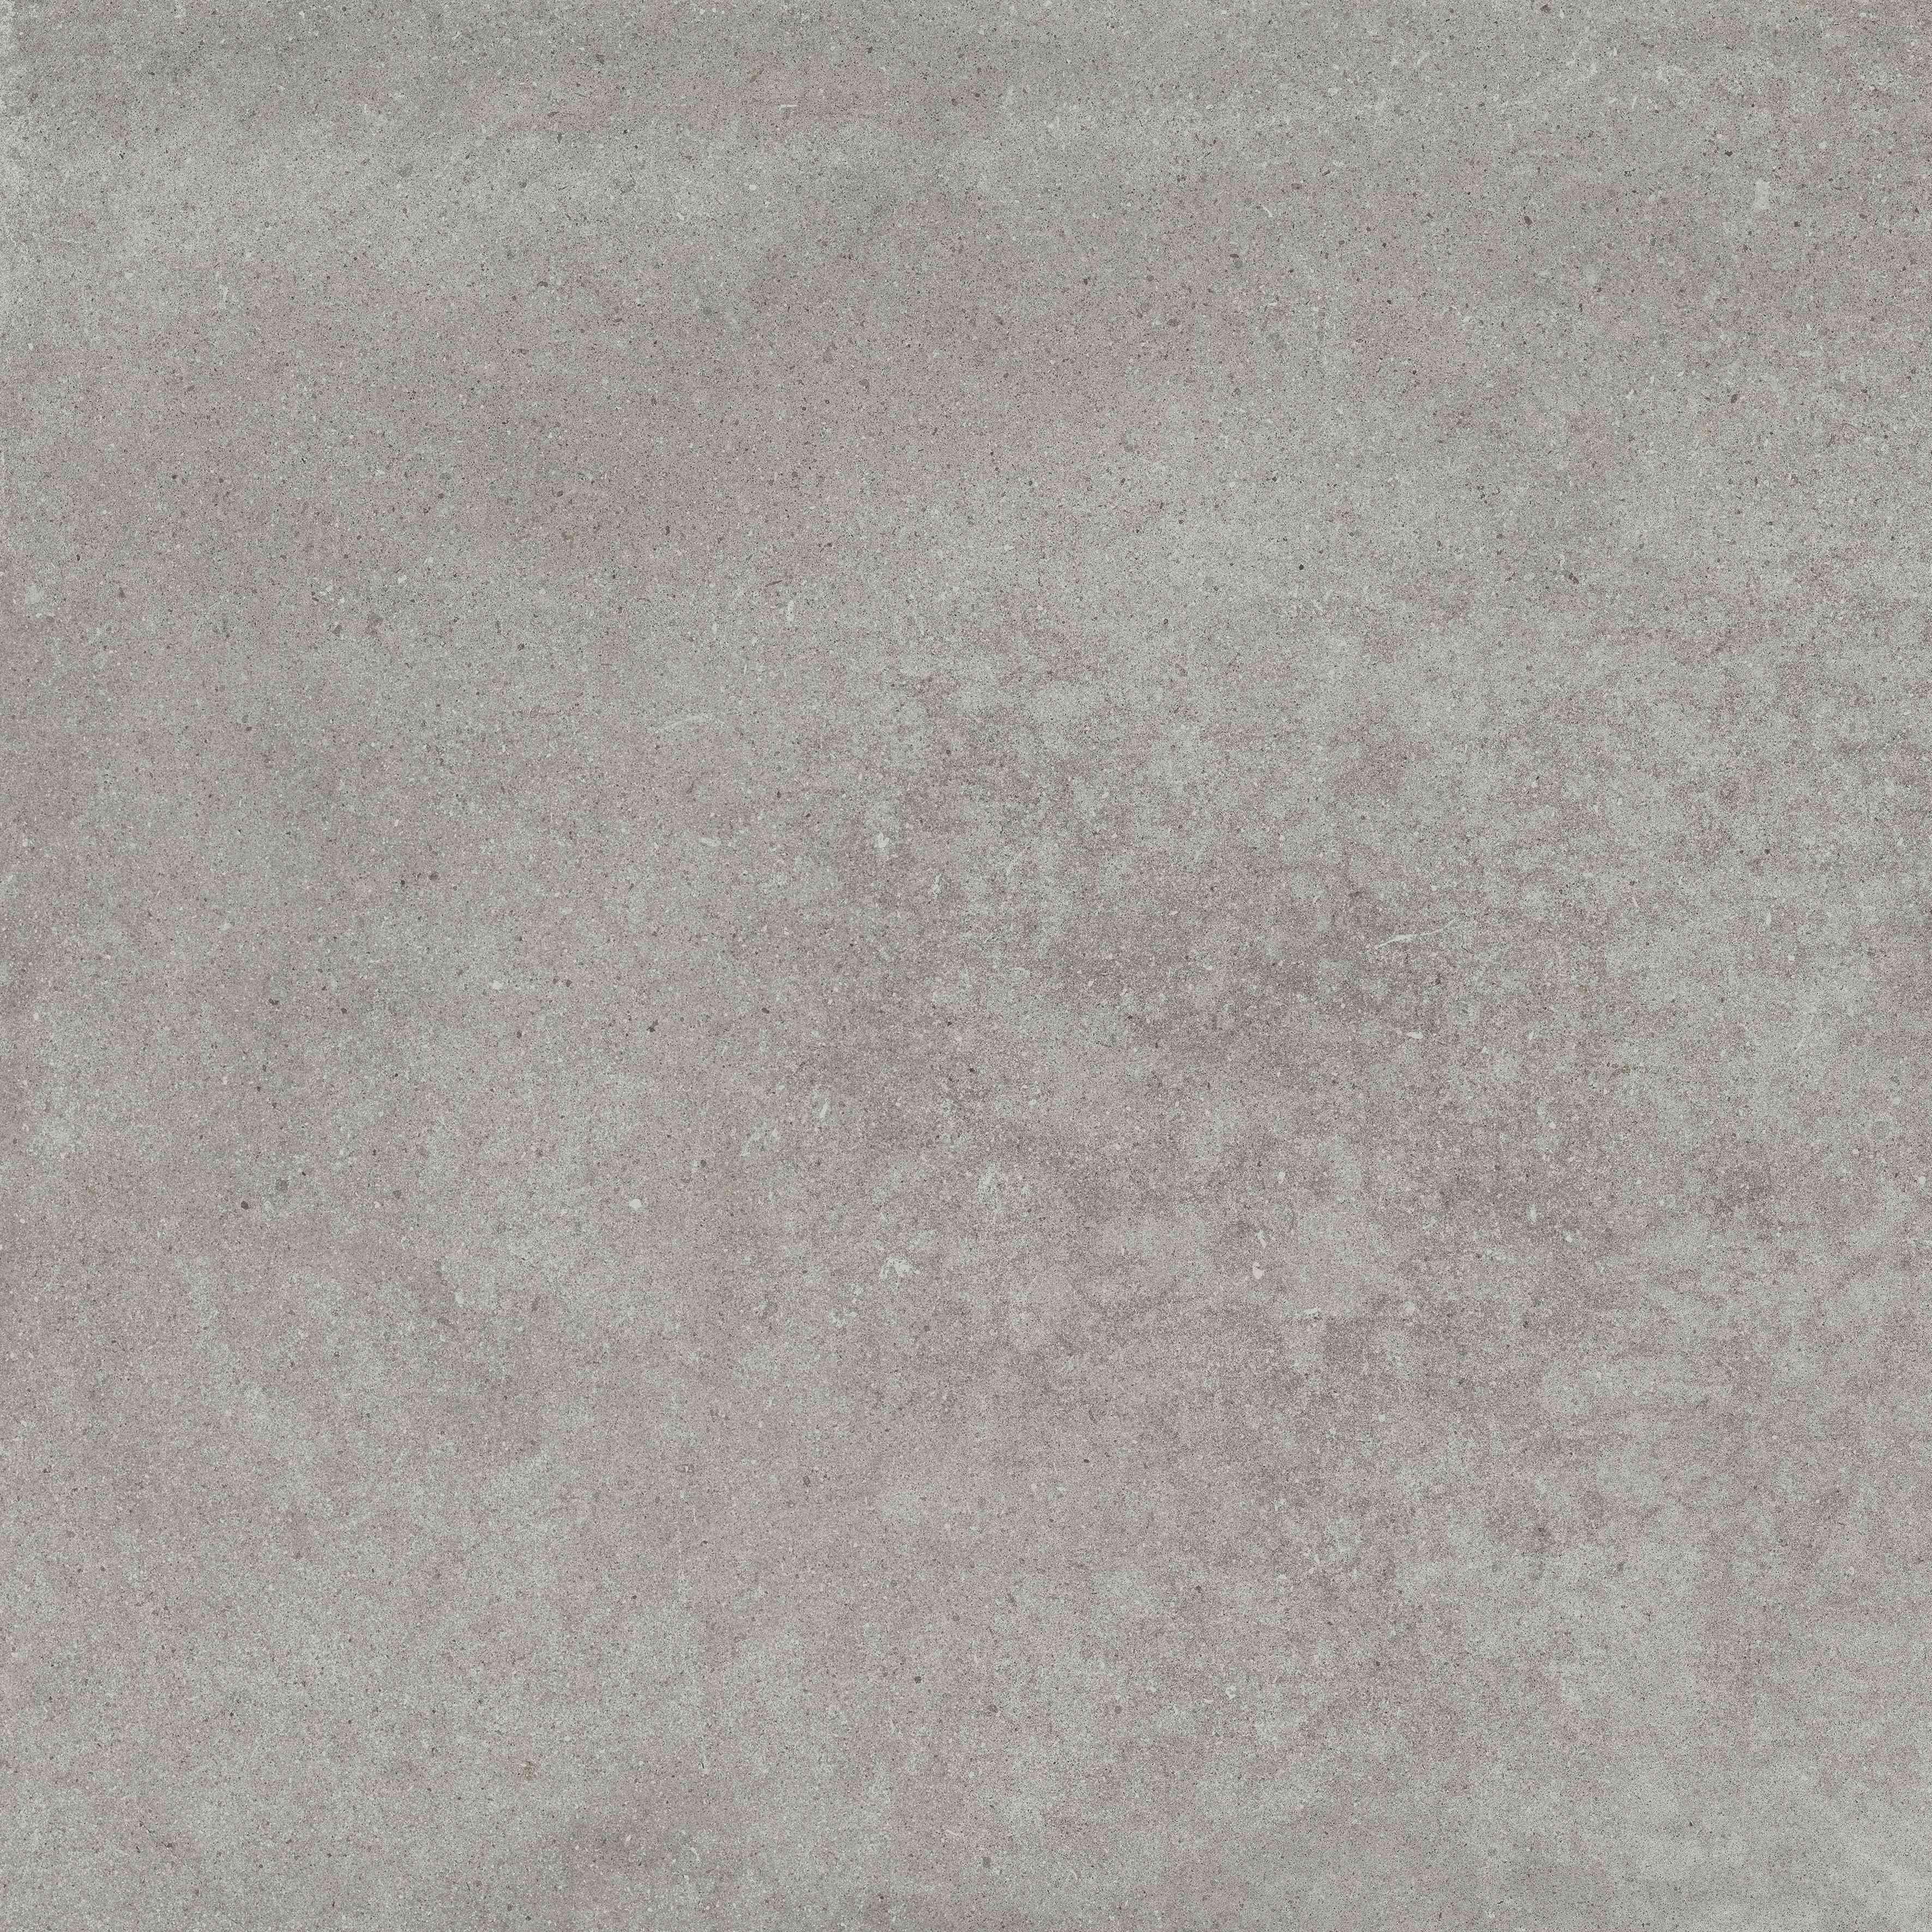 Плитка GRIGIO (ZRXRM8R) изображение 9